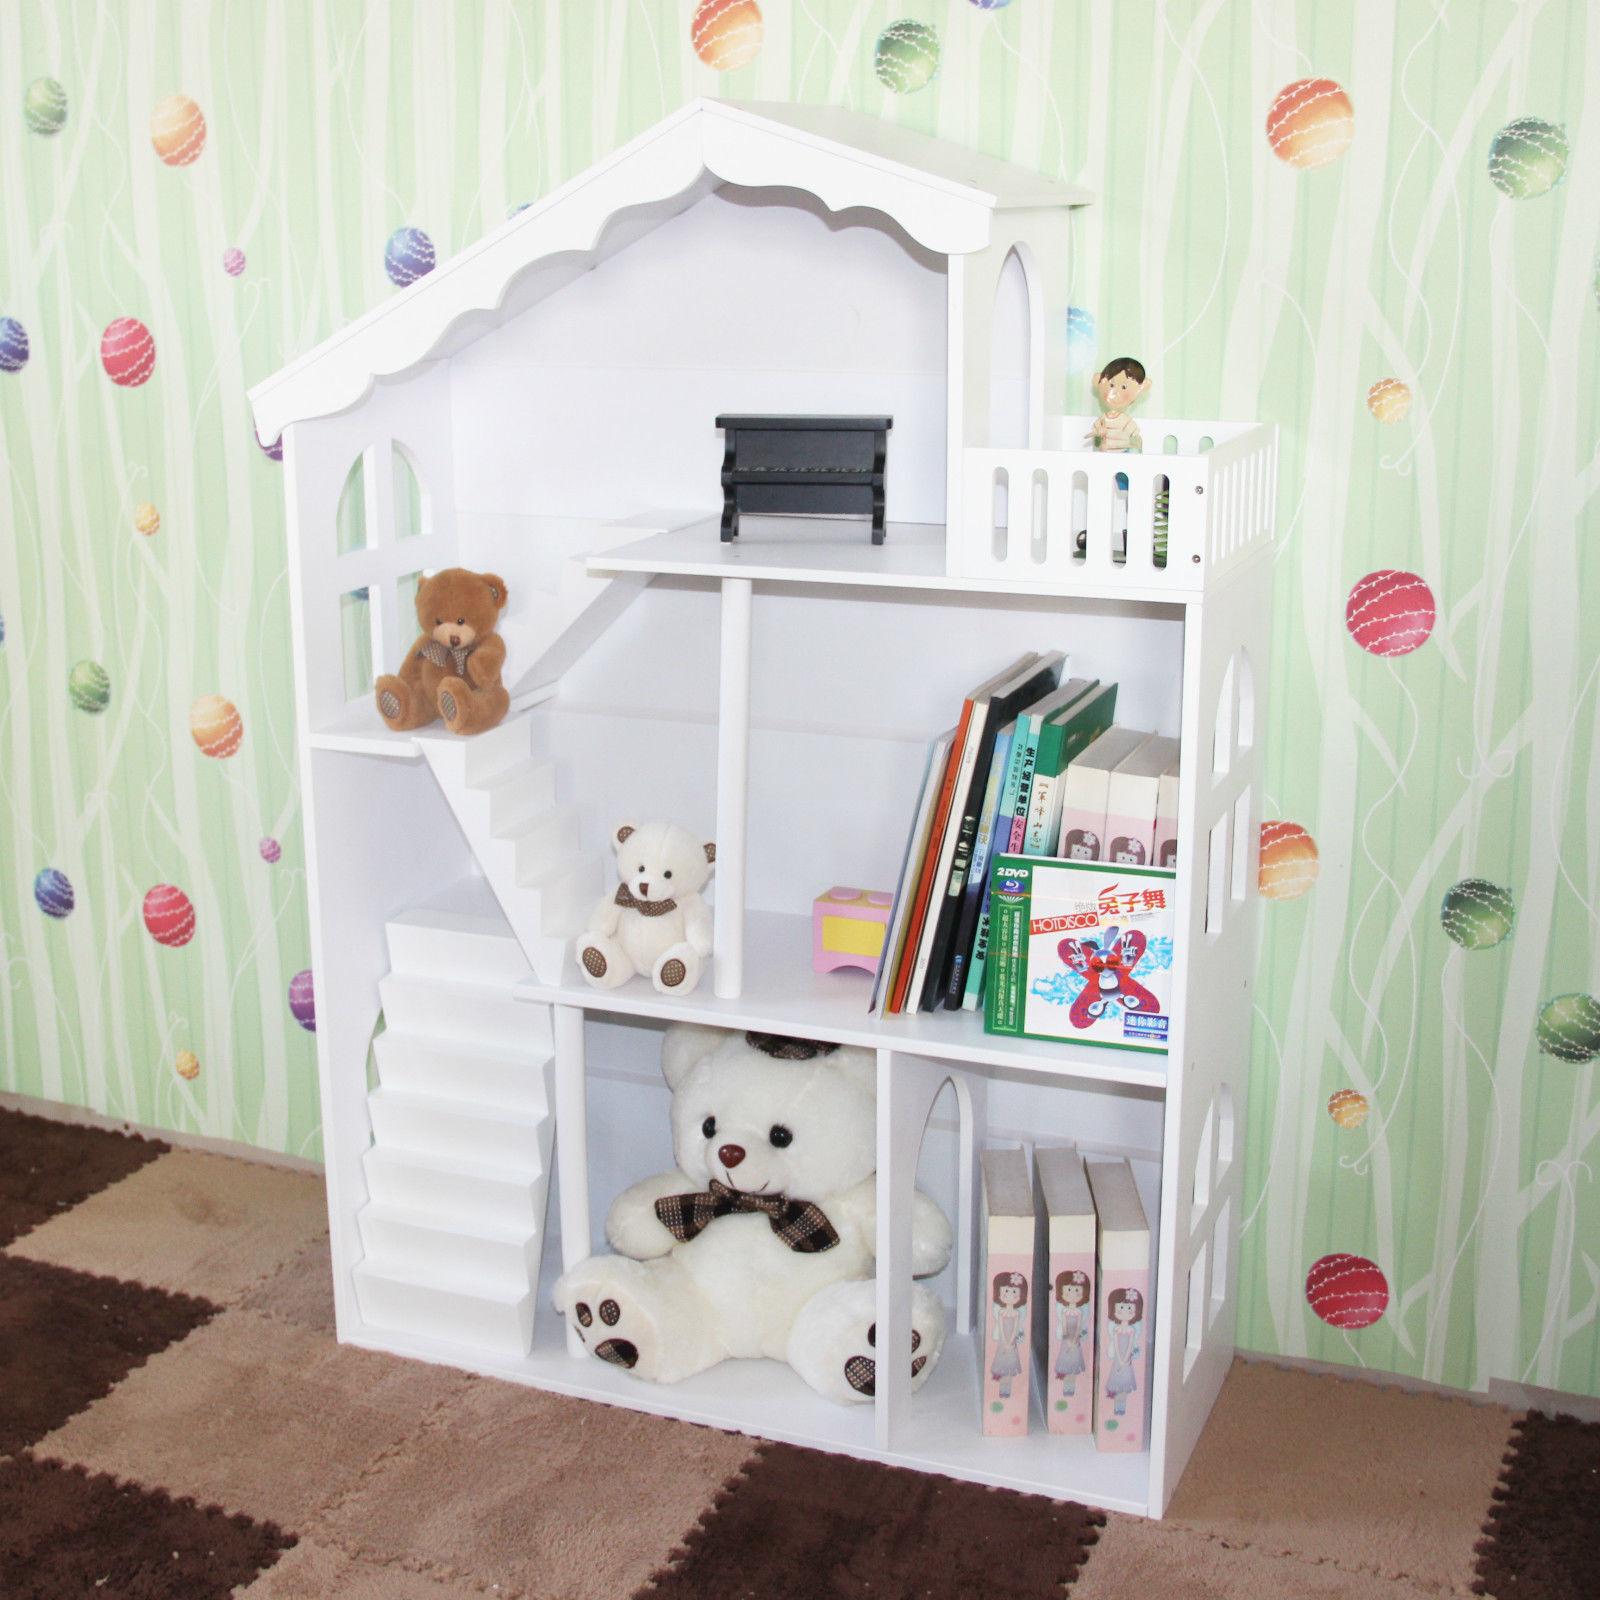 Dollhouse Bookcase Diy: How To Build A Dollhouse Bookcase